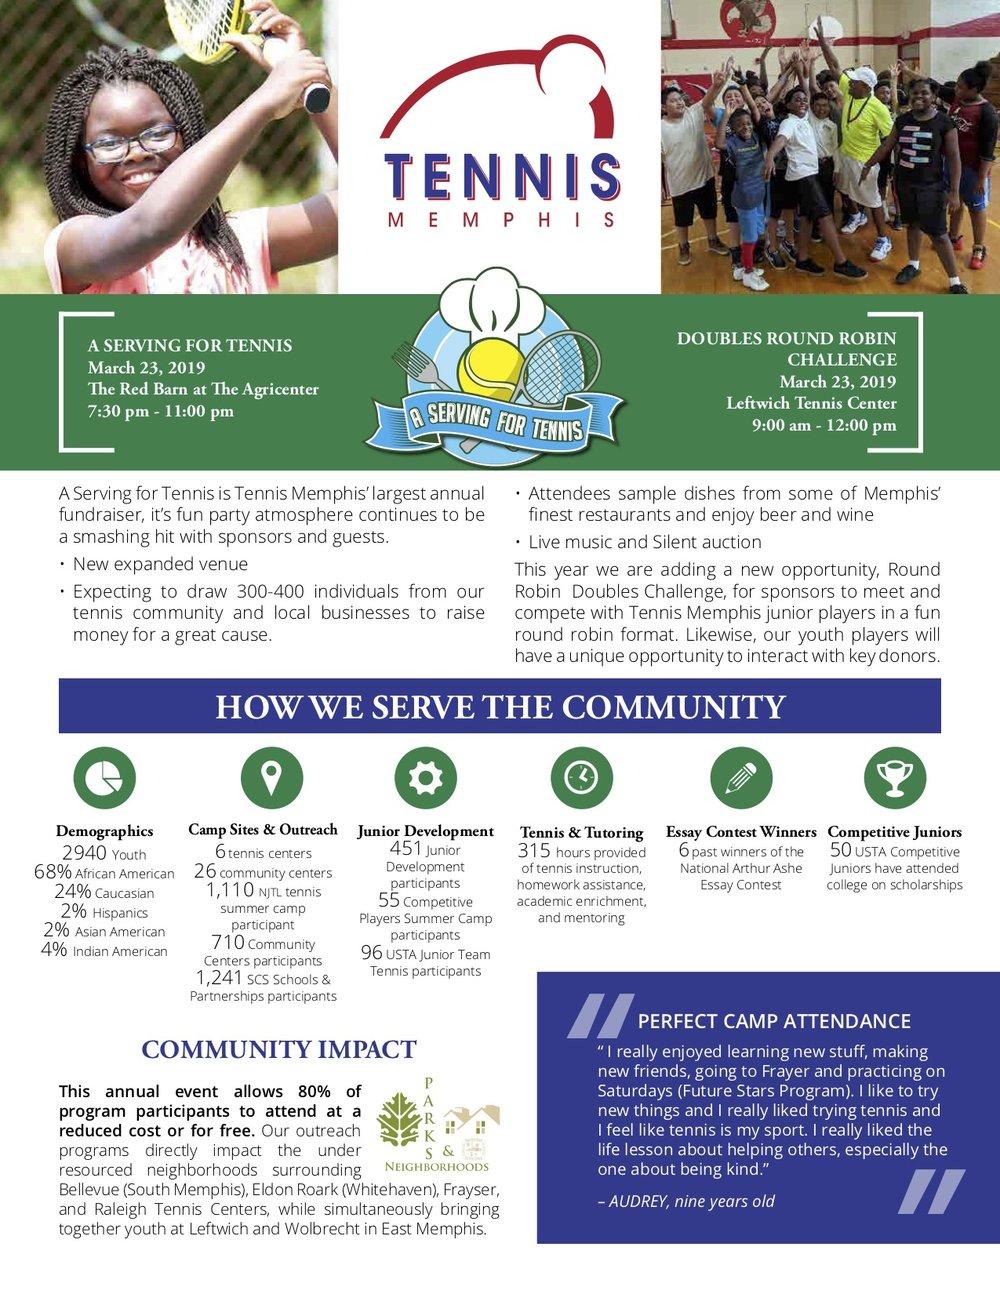 TennisMphsDonorBenefits730timev2.jpg